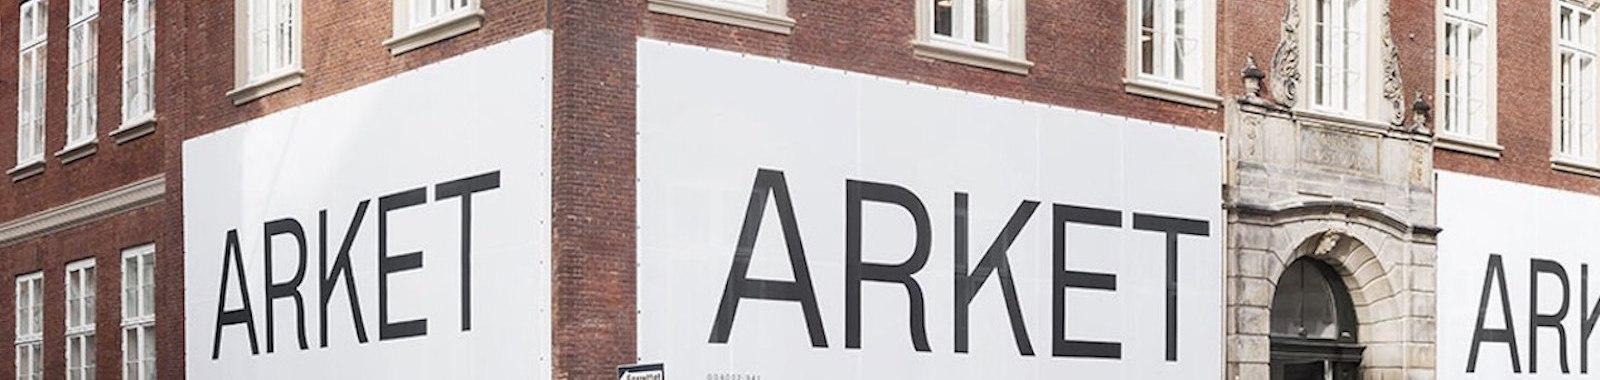 arket-large top